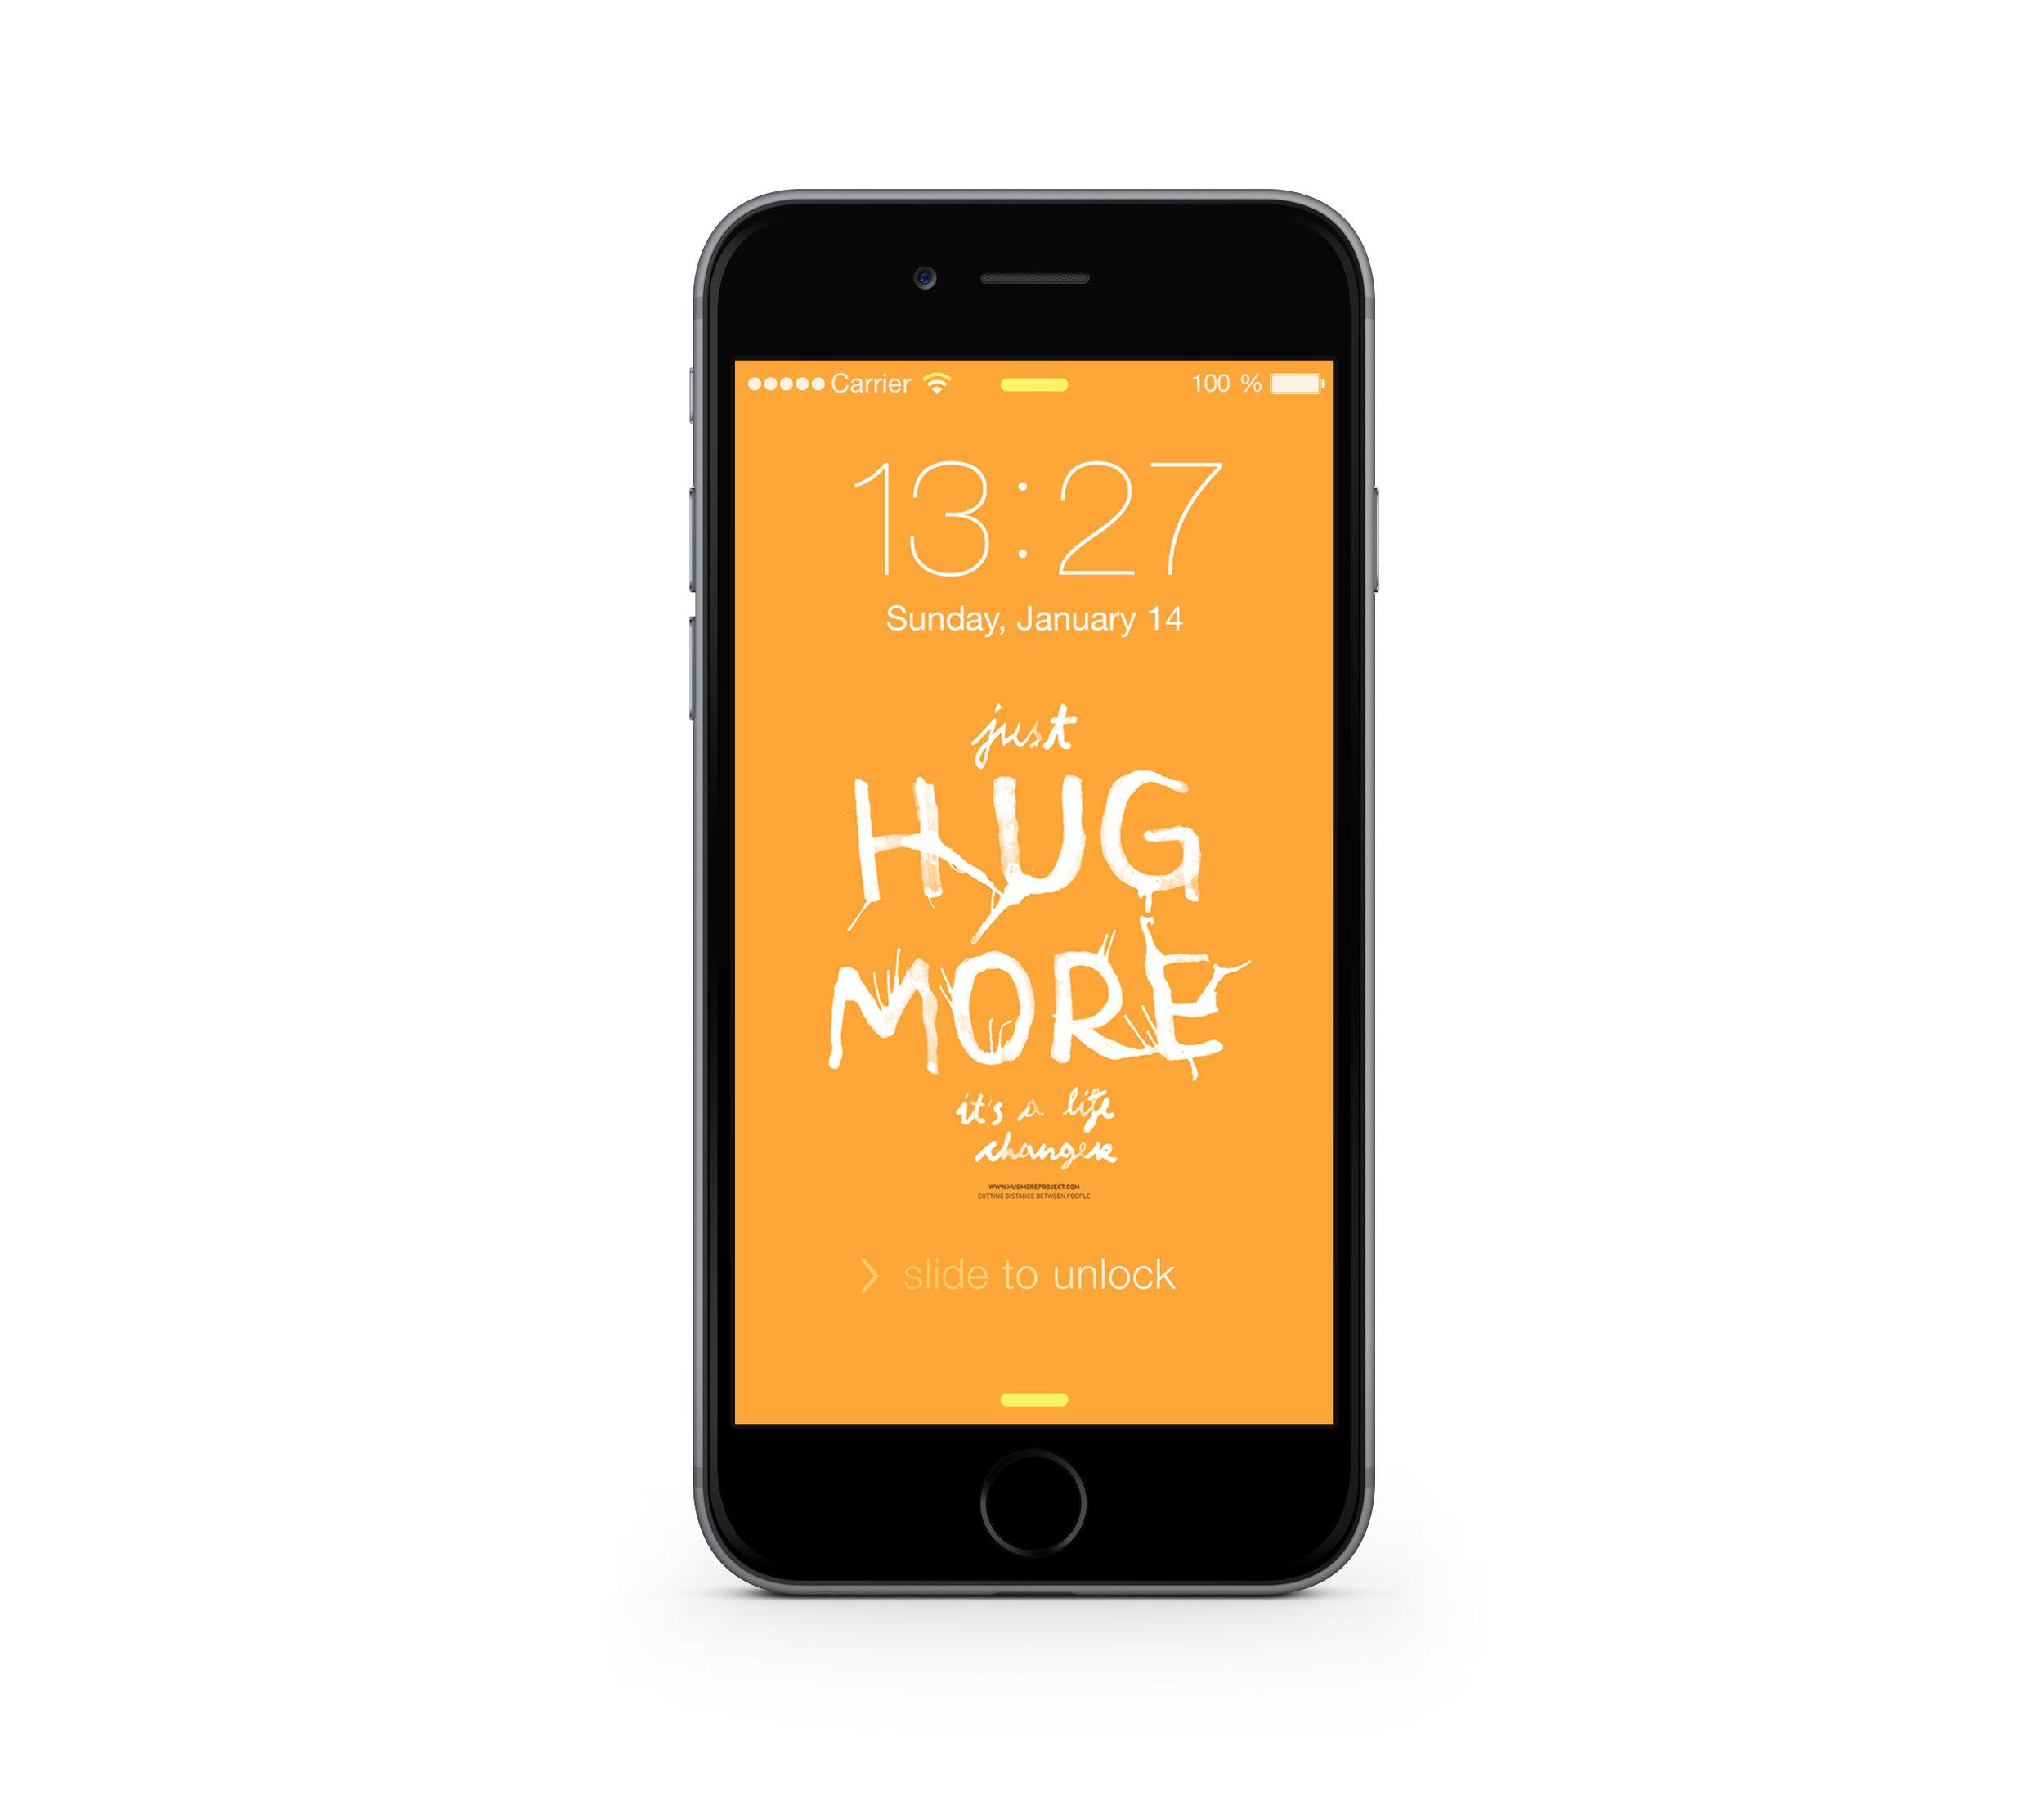 just-hug-more-typo-020-iPhone-mockup-onwhite.jpg